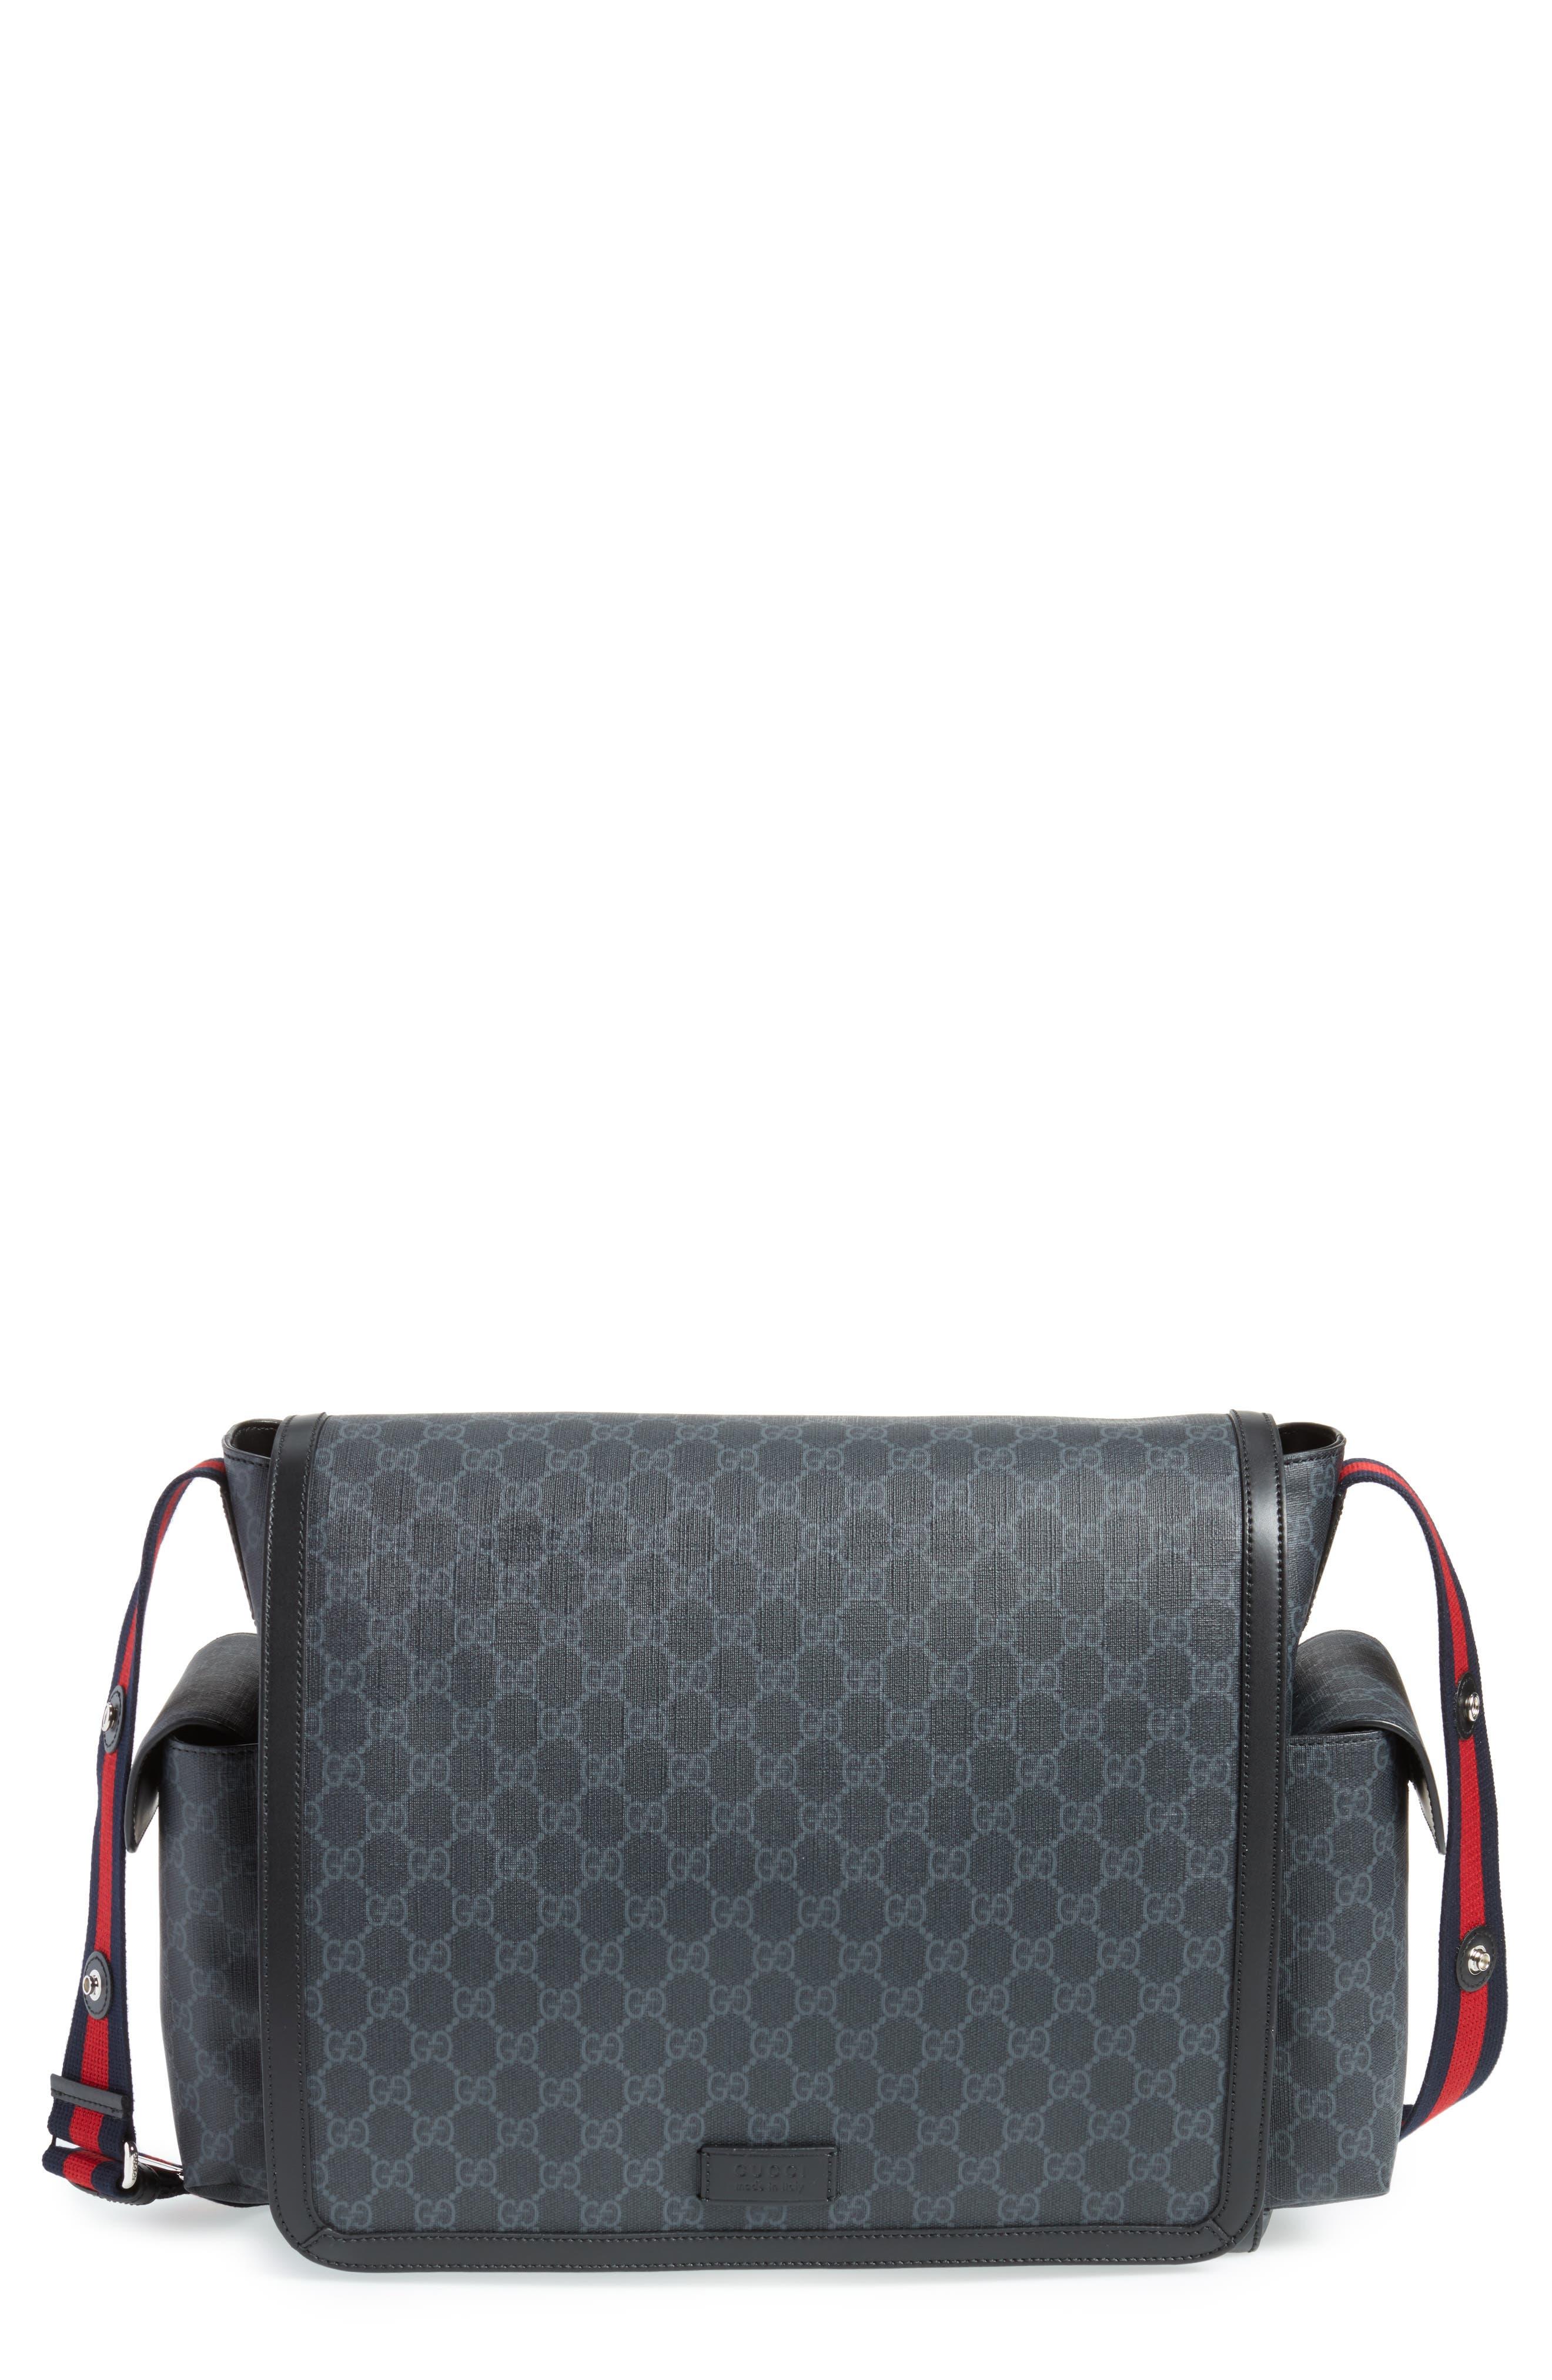 GG Supreme Canvas Diaper Bag,                         Main,                         color, BLACK